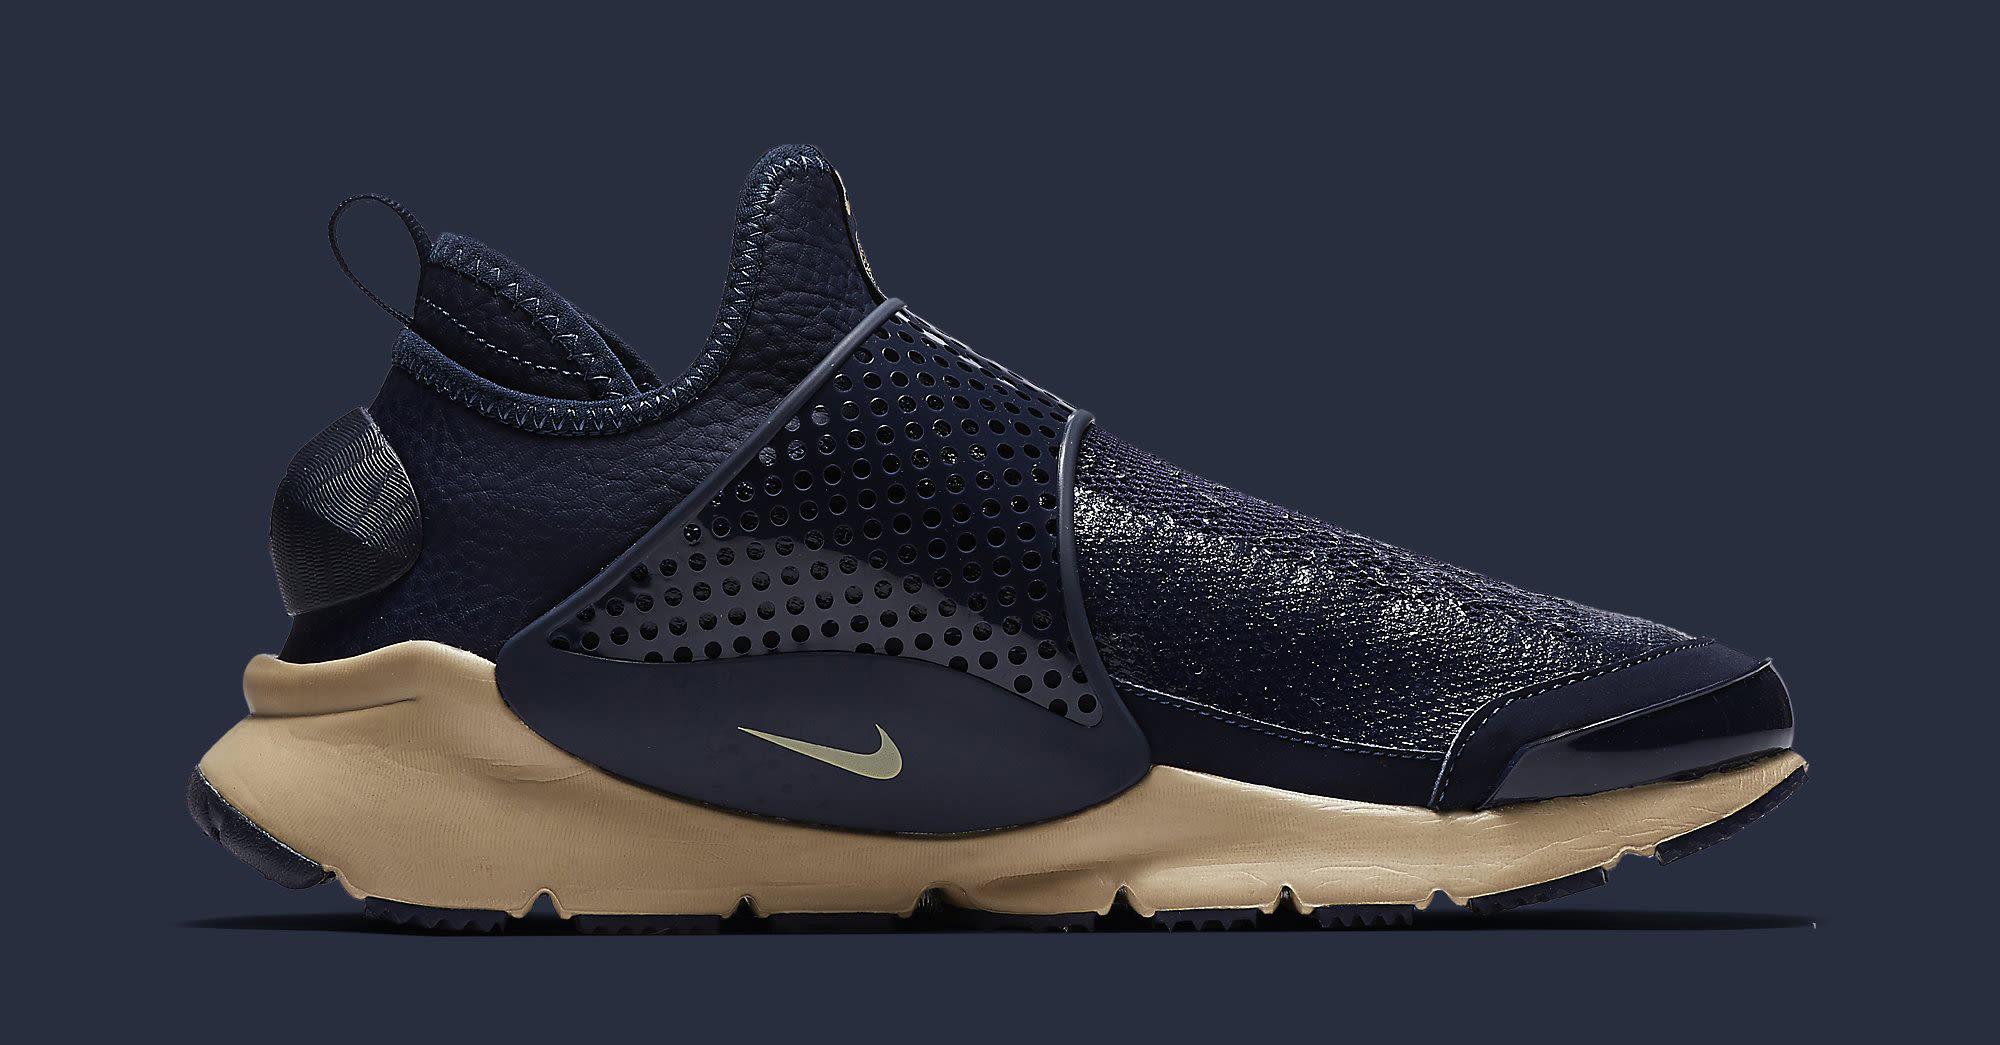 Stone Island Nike Sock Dart 910090-400 Medial